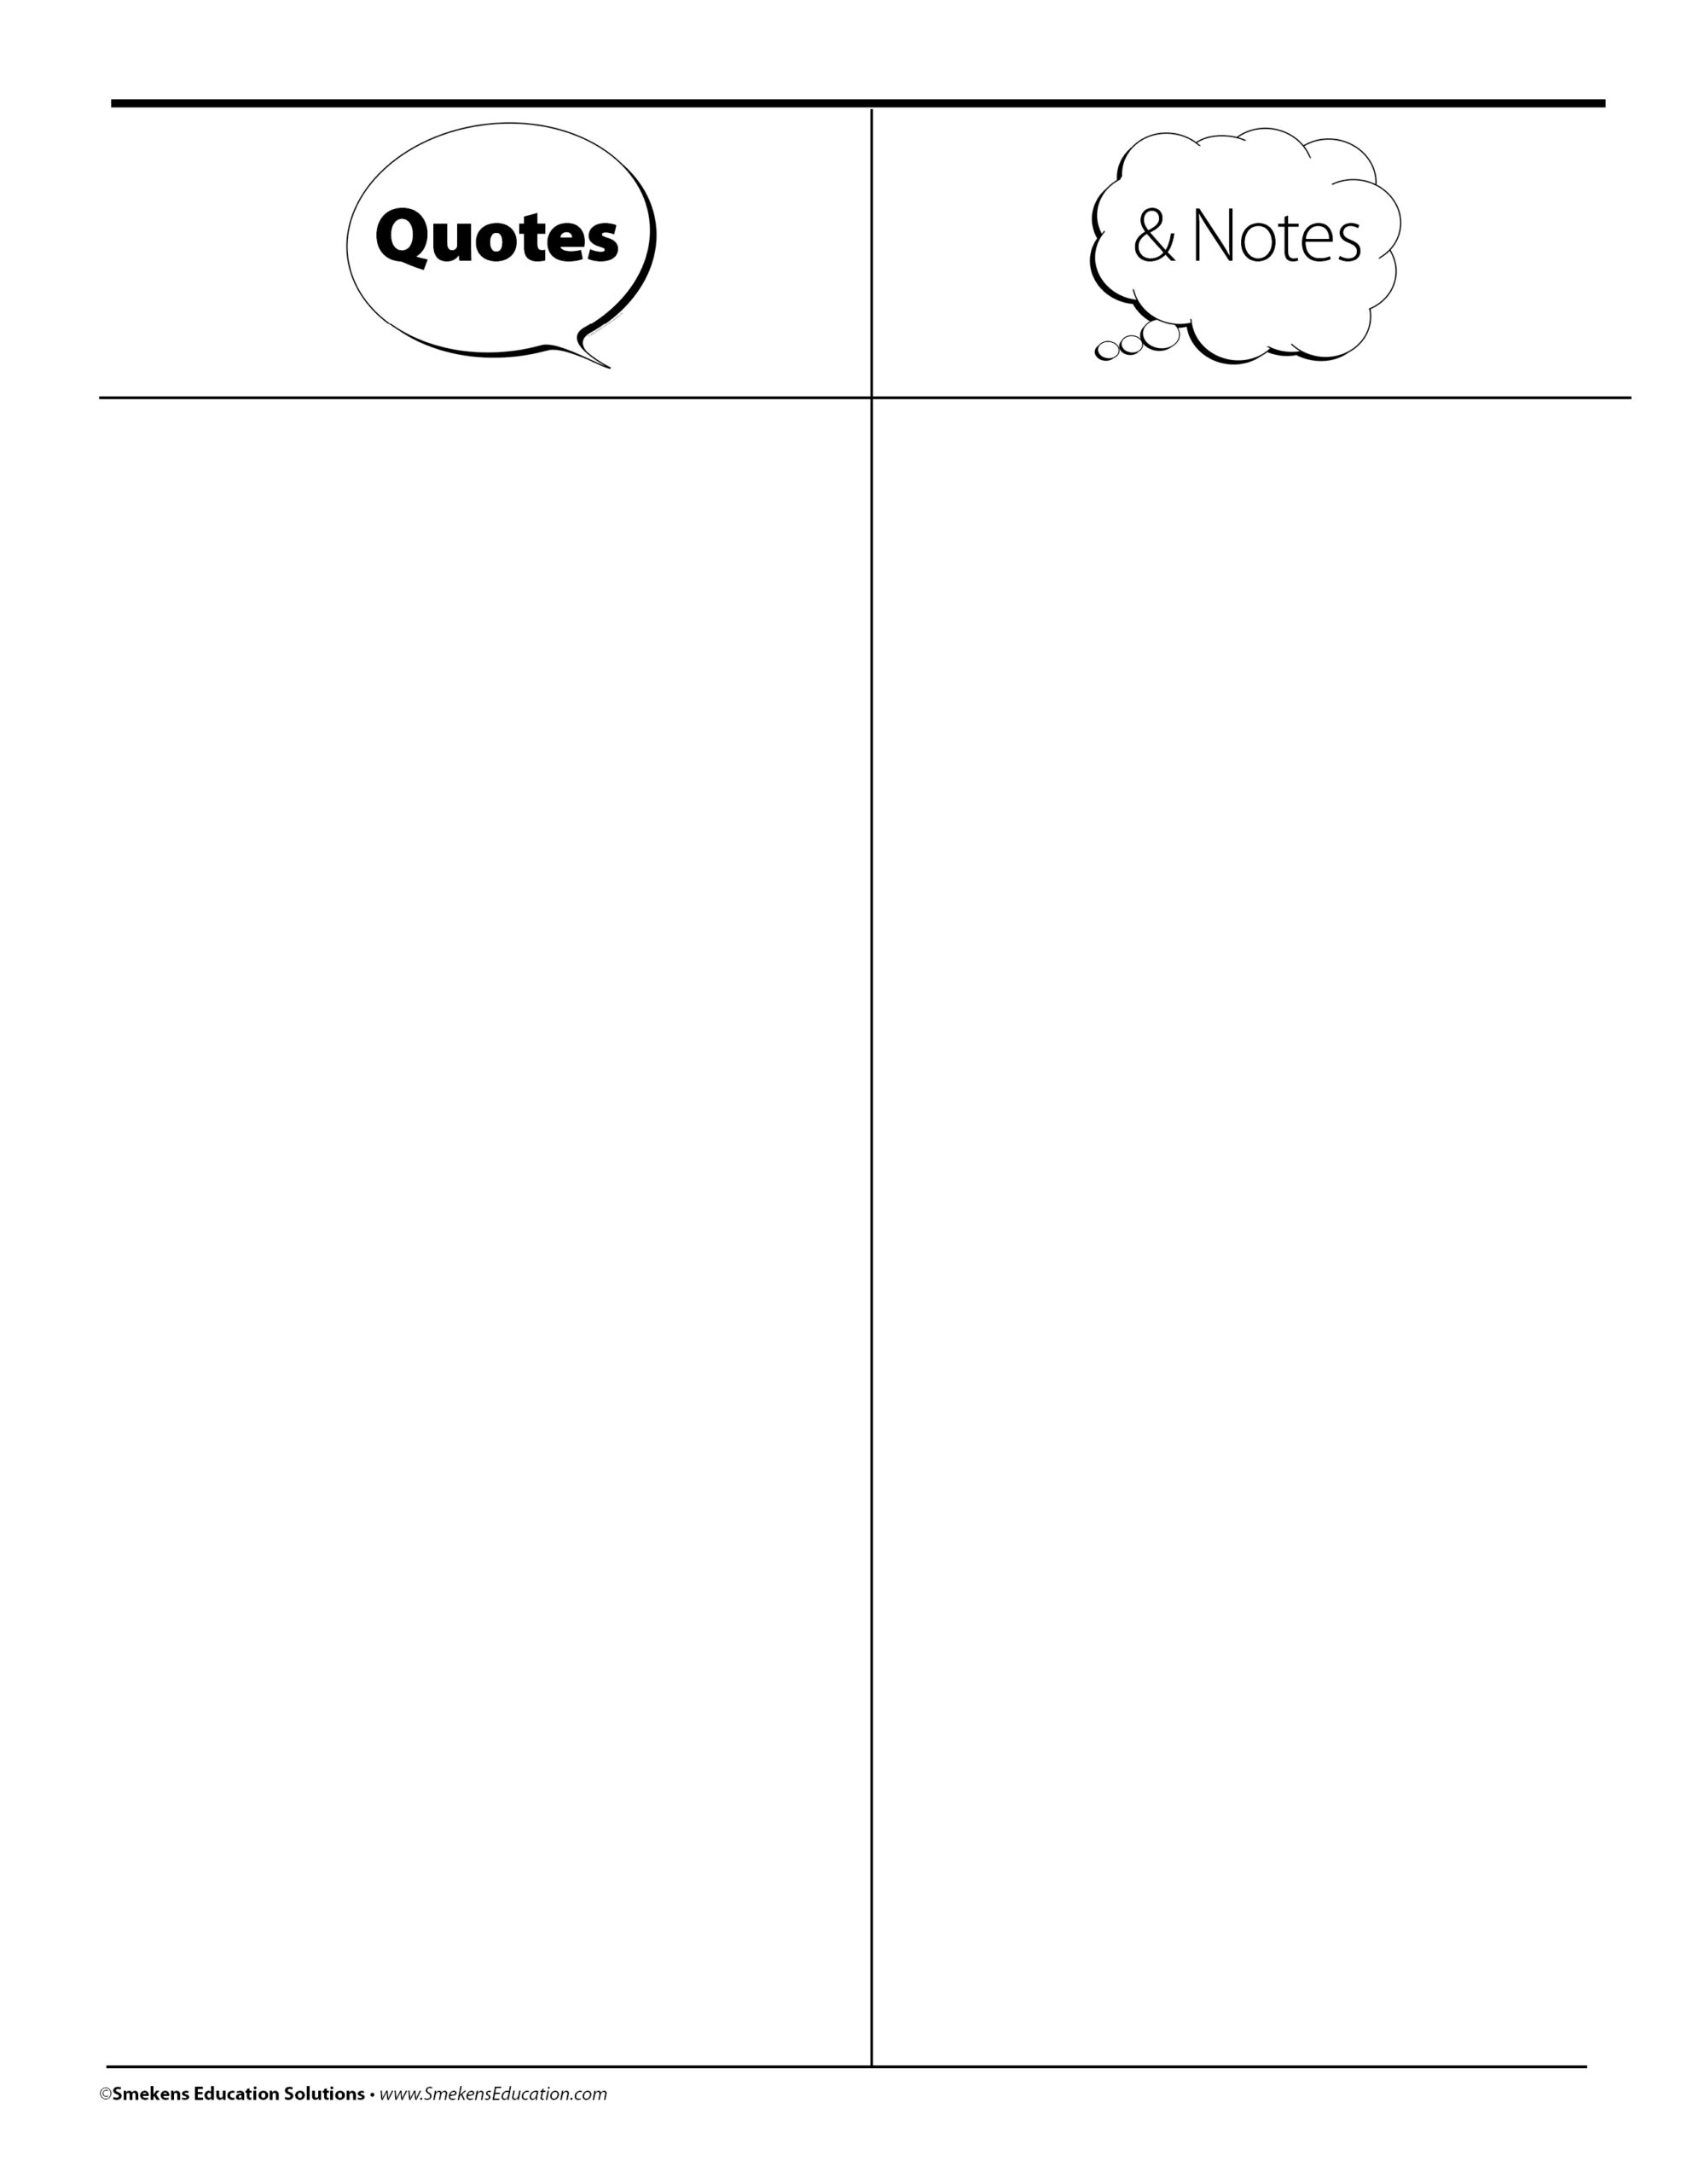 Quotes & Notes Organizer Sheet